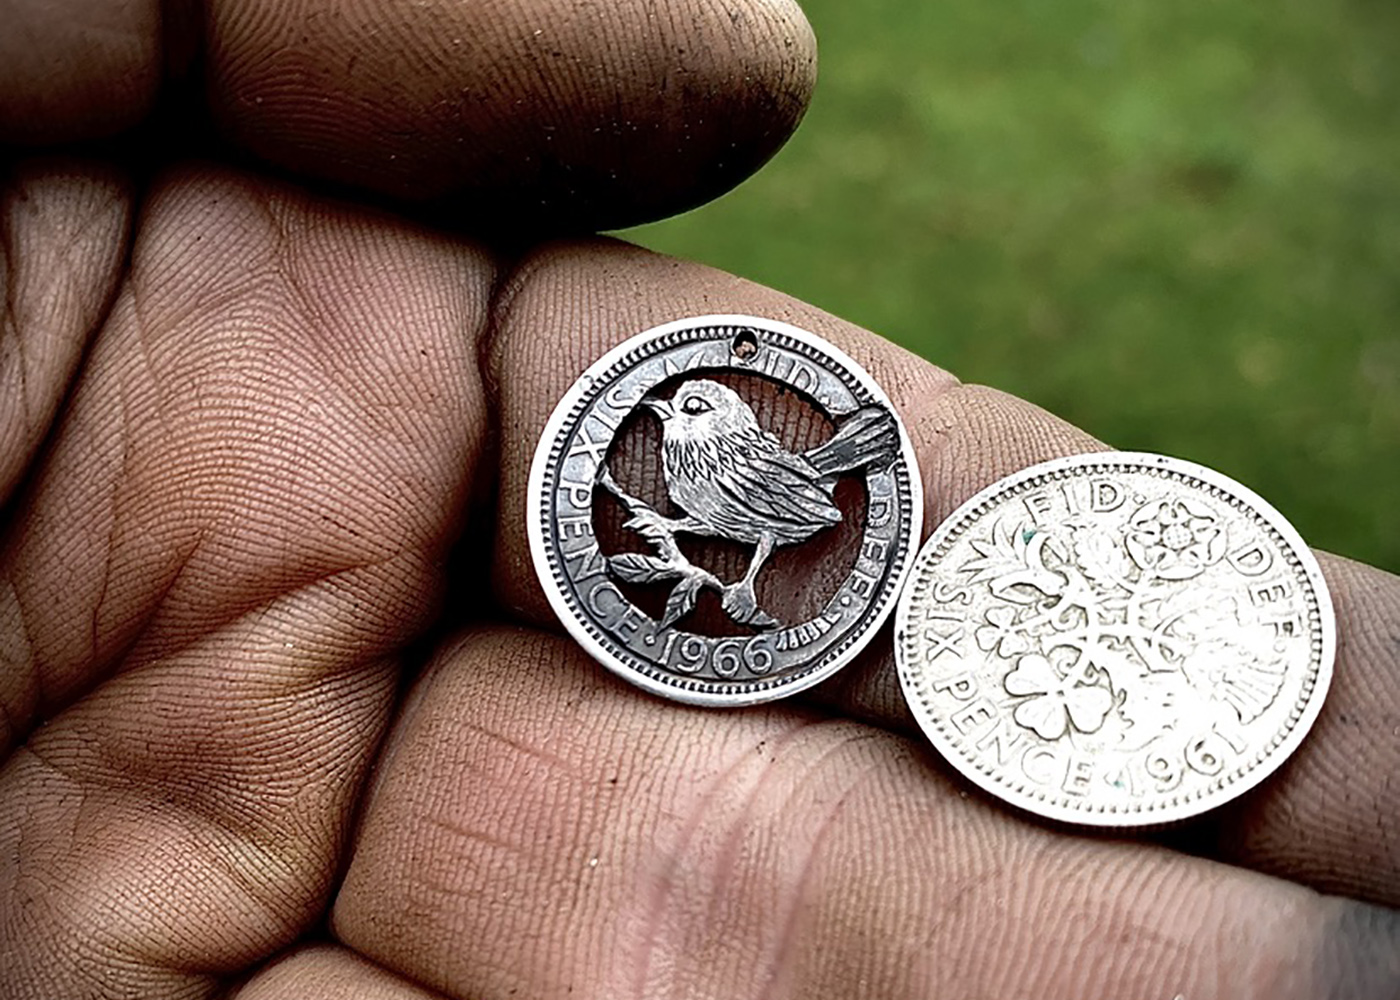 lucky sixpence jenny wren farthing